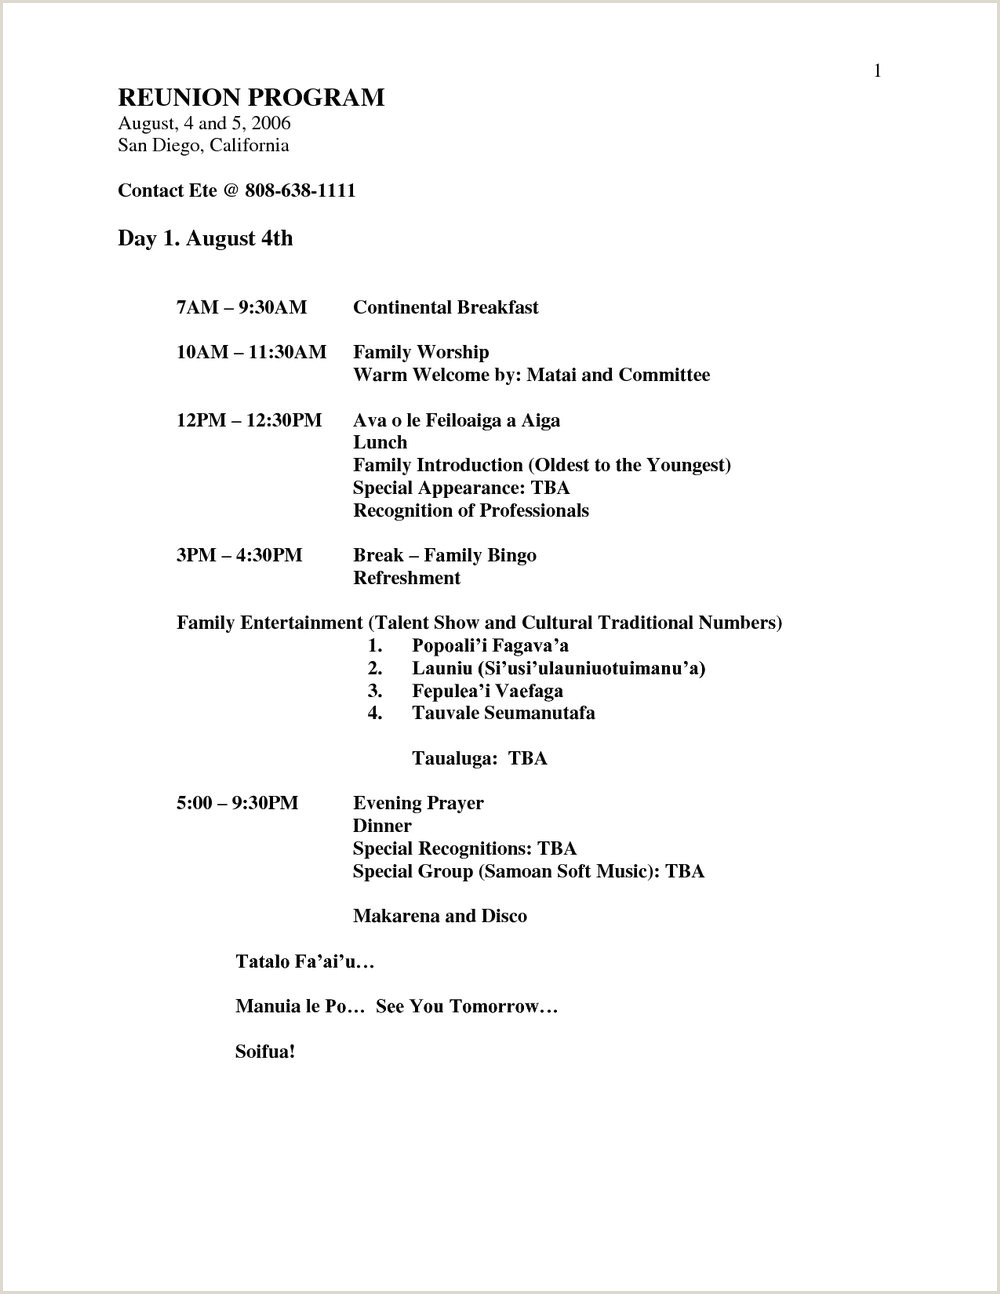 Family Reunion Banquet Program Samples Templates Njg0MDU